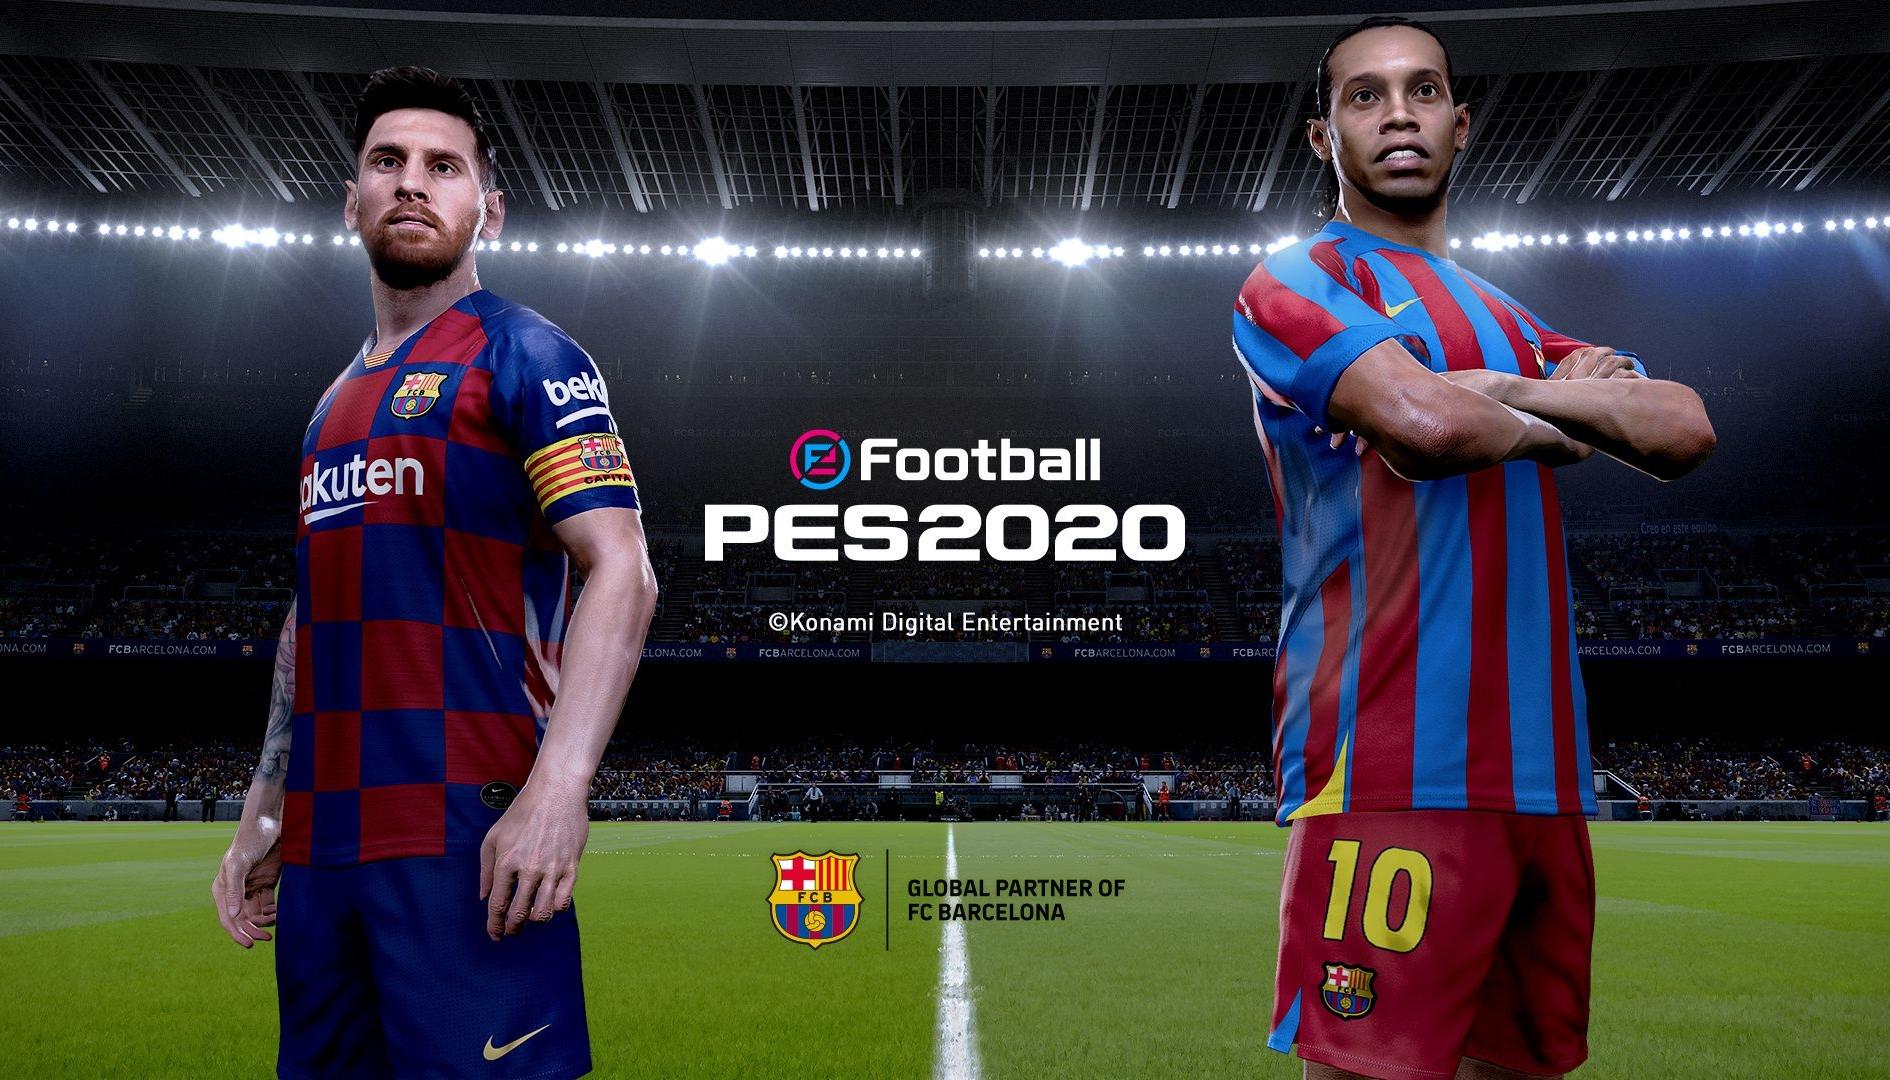 eFootball PES 2020 avrà la licenza Serie A Tim